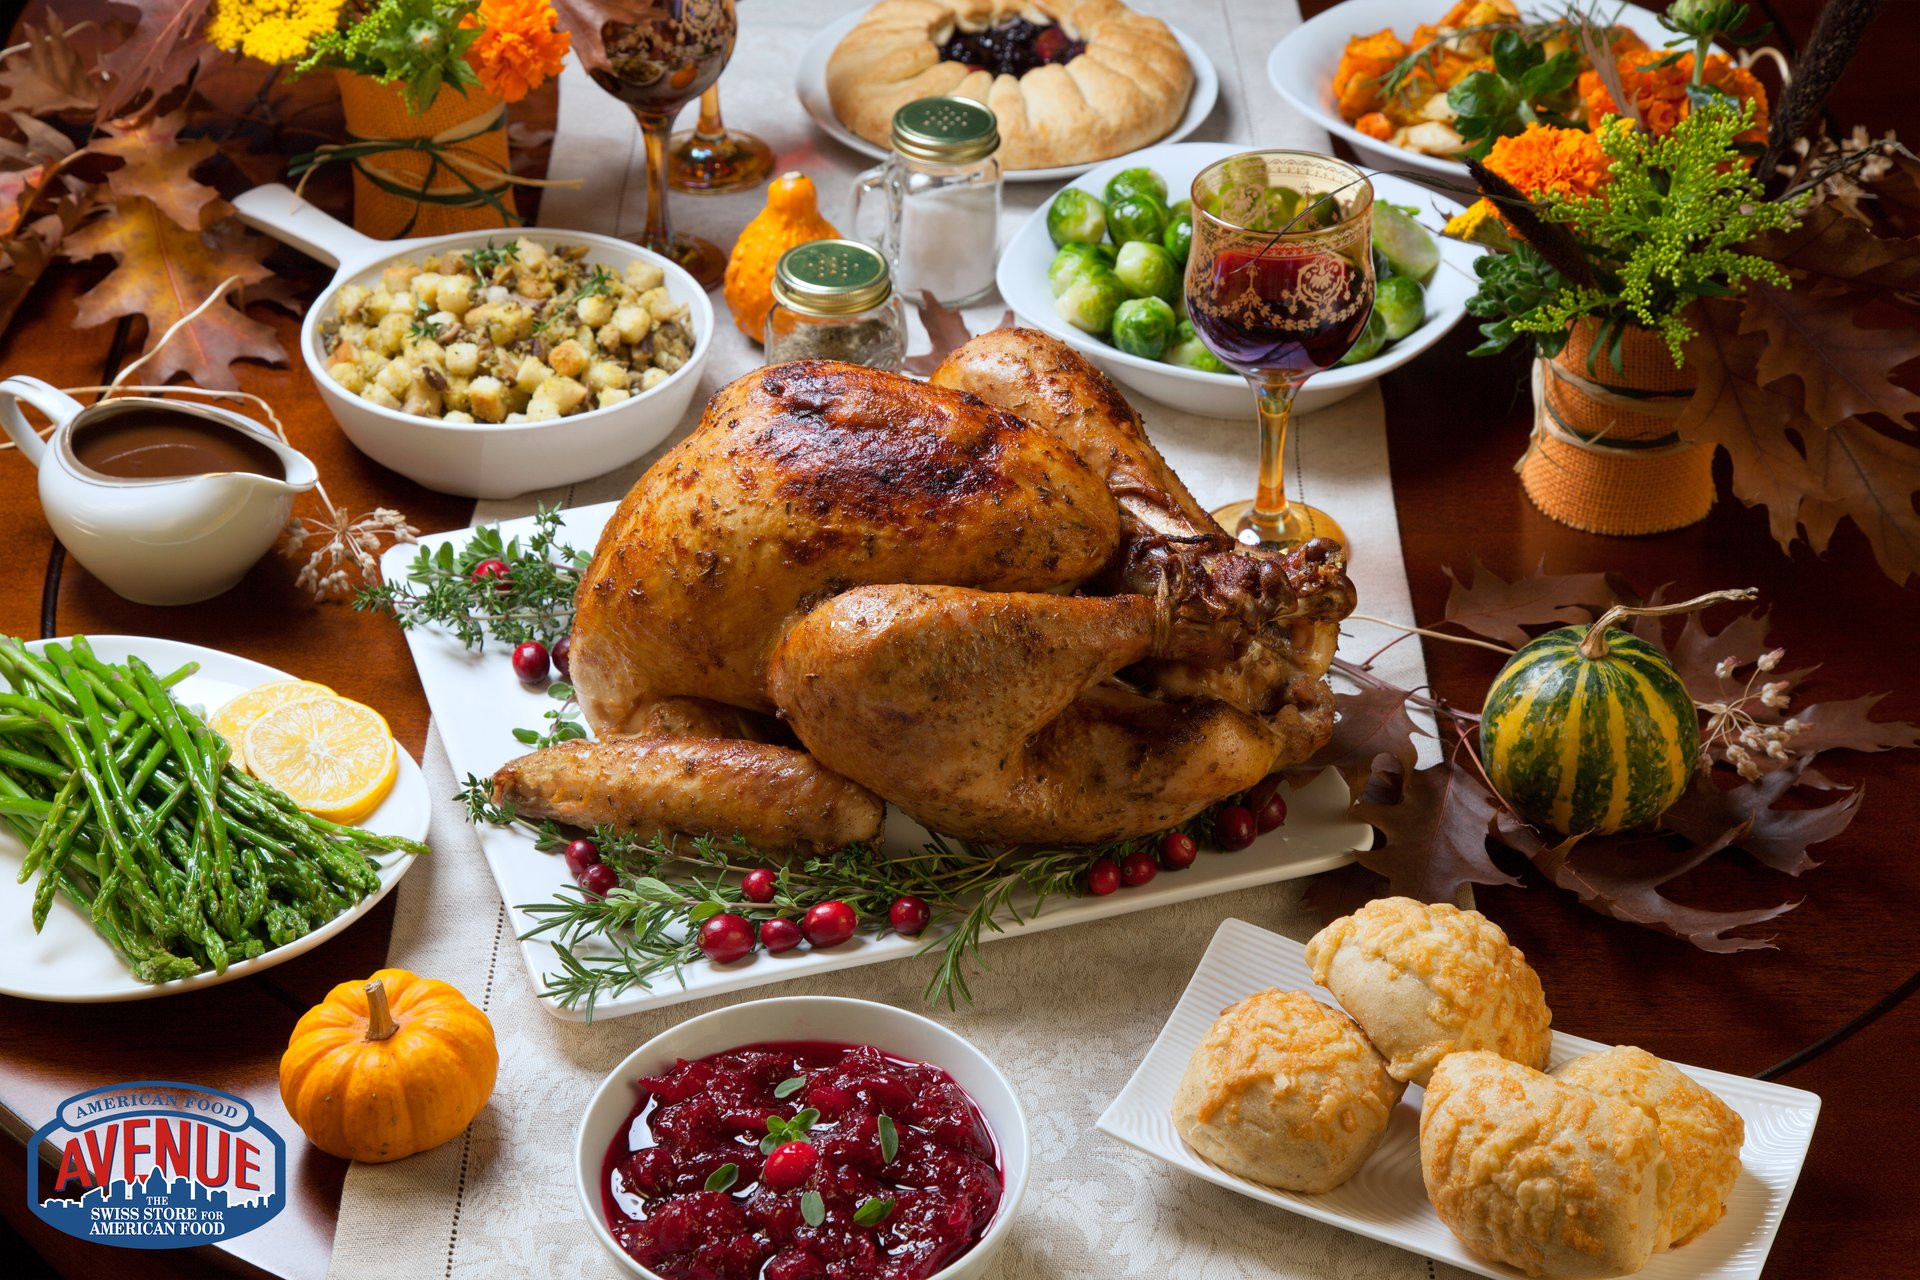 Wegmans Thanksgiving Turkey  American Food Avenue The Swiss Store for American Food